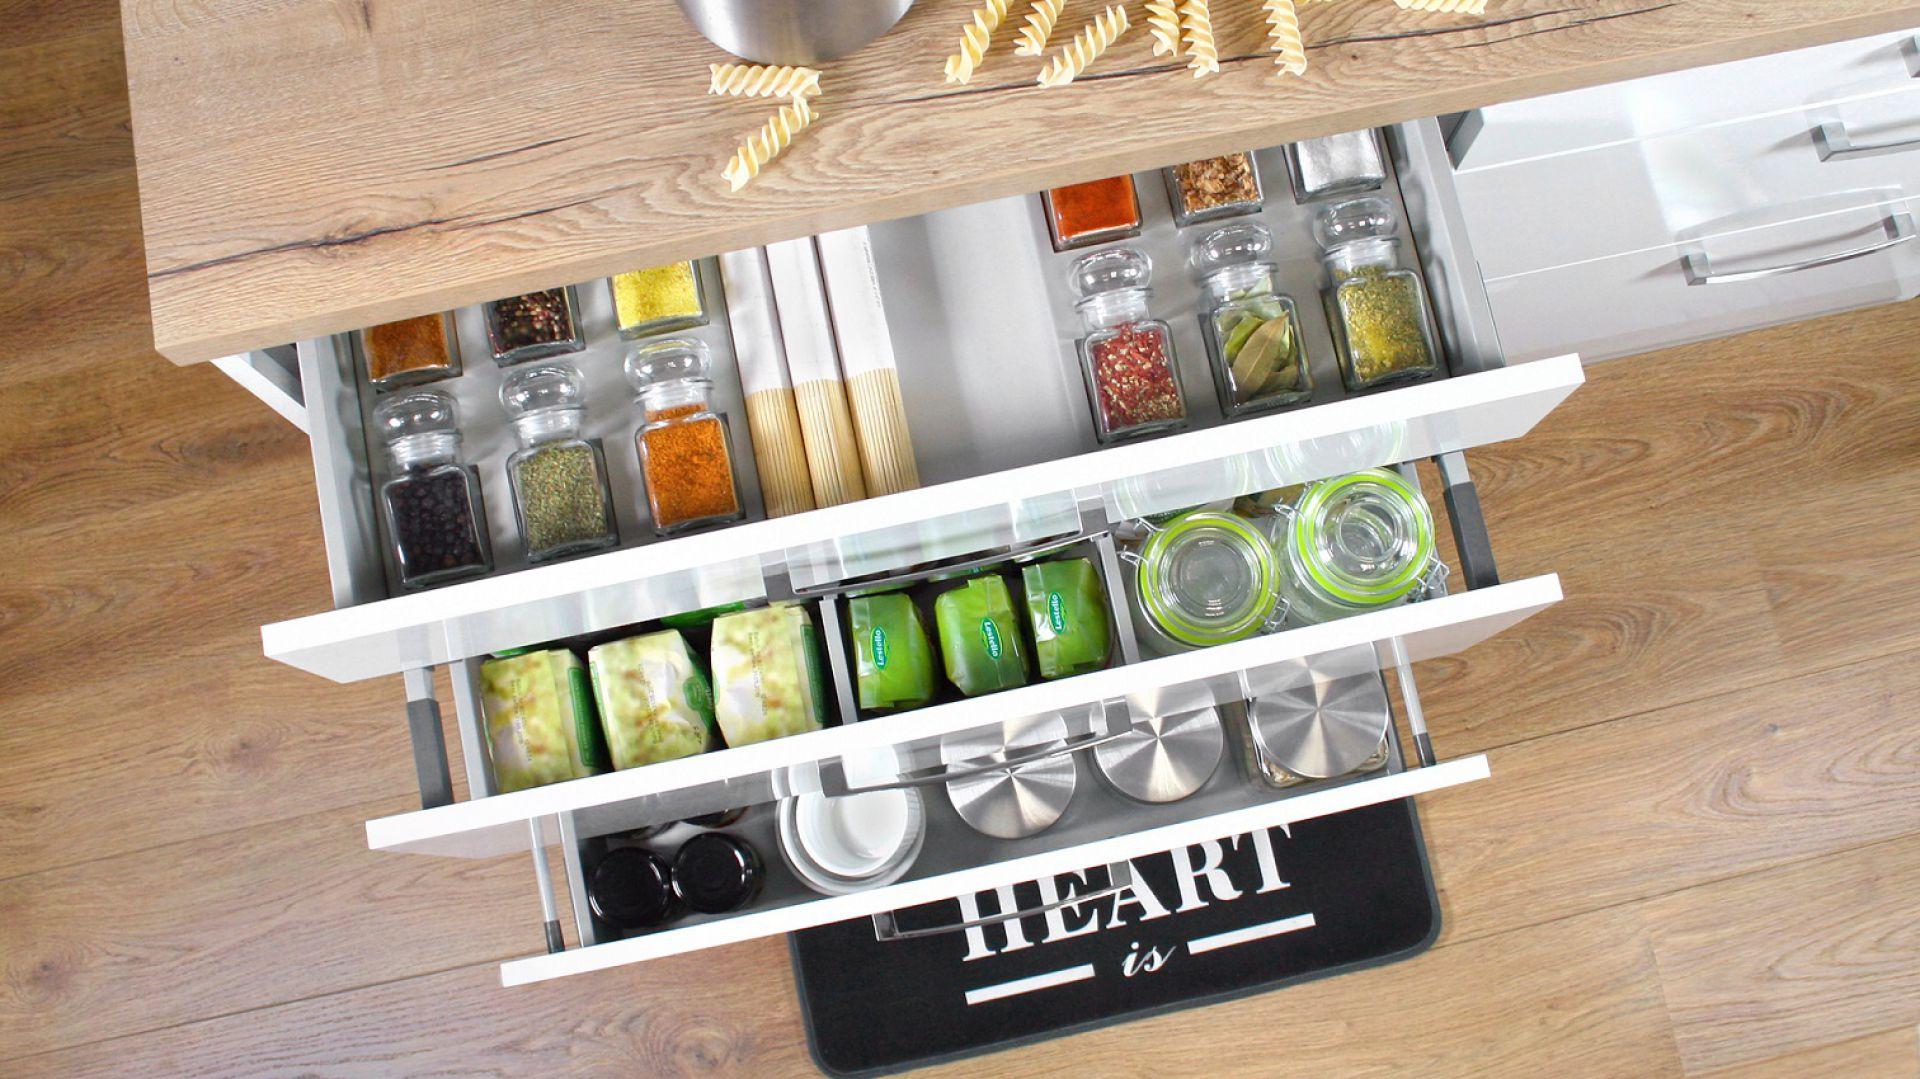 Akcesoria meblowe do funkcjonalnej kuchni: szuflada Comfort Box. Fot. Rejs